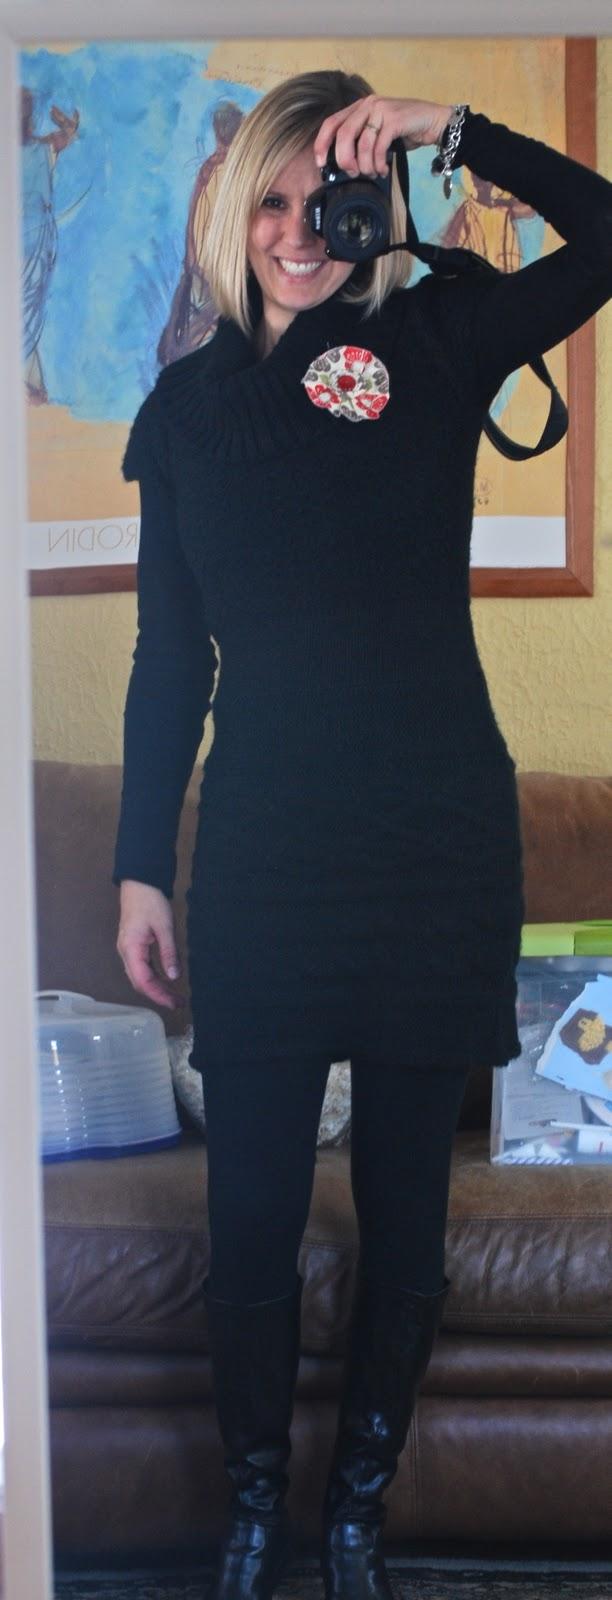 Sweater Dress: Kohls, Leggings: Target, Black Shirt: Target, Bracelets:  Tiffany & Co, & My Charm Bracelet Since I Was A Kid, Flower: Eisley Rae,